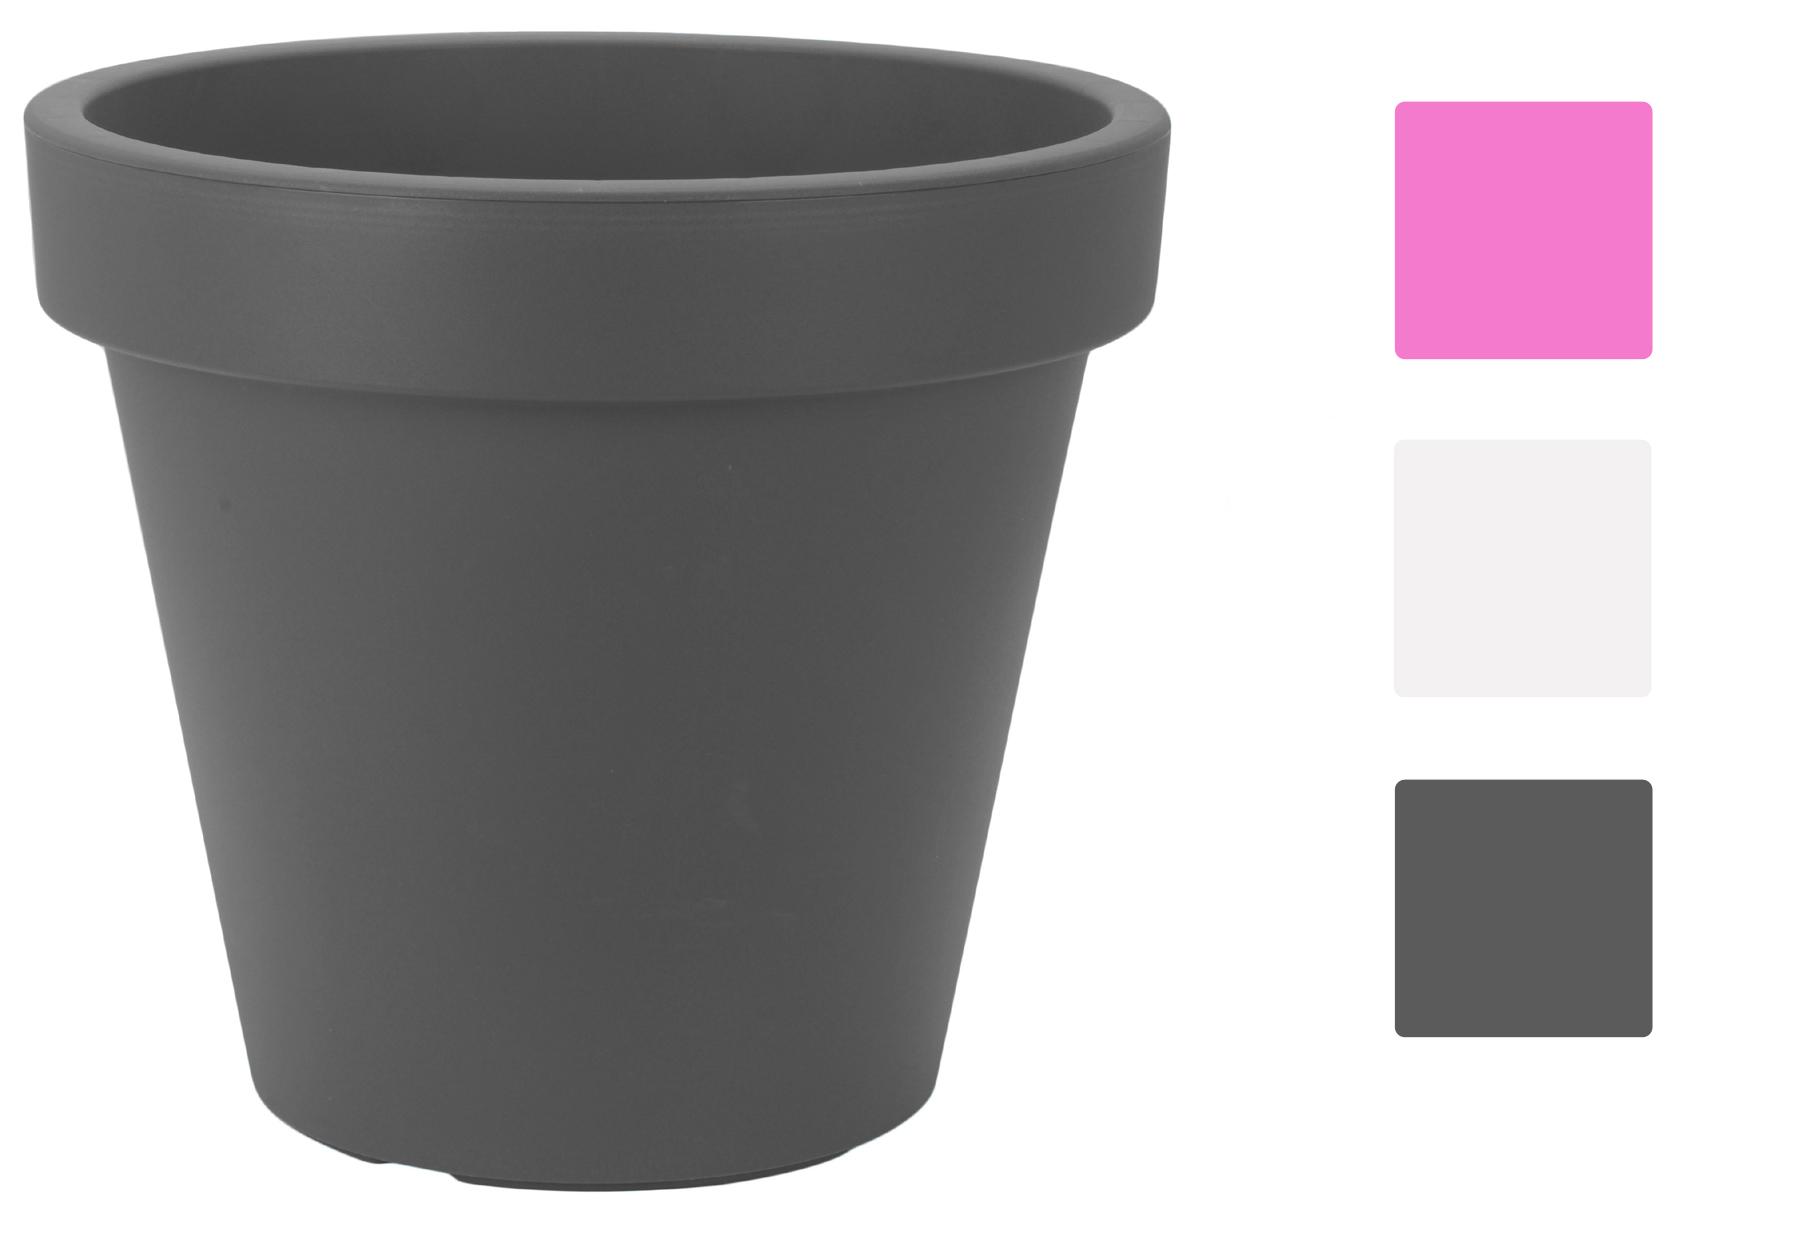 xxl pflanzkuebel pflanztopf blumentopf blumenkuebel kunststoff 60cm pflanzschale ebay. Black Bedroom Furniture Sets. Home Design Ideas